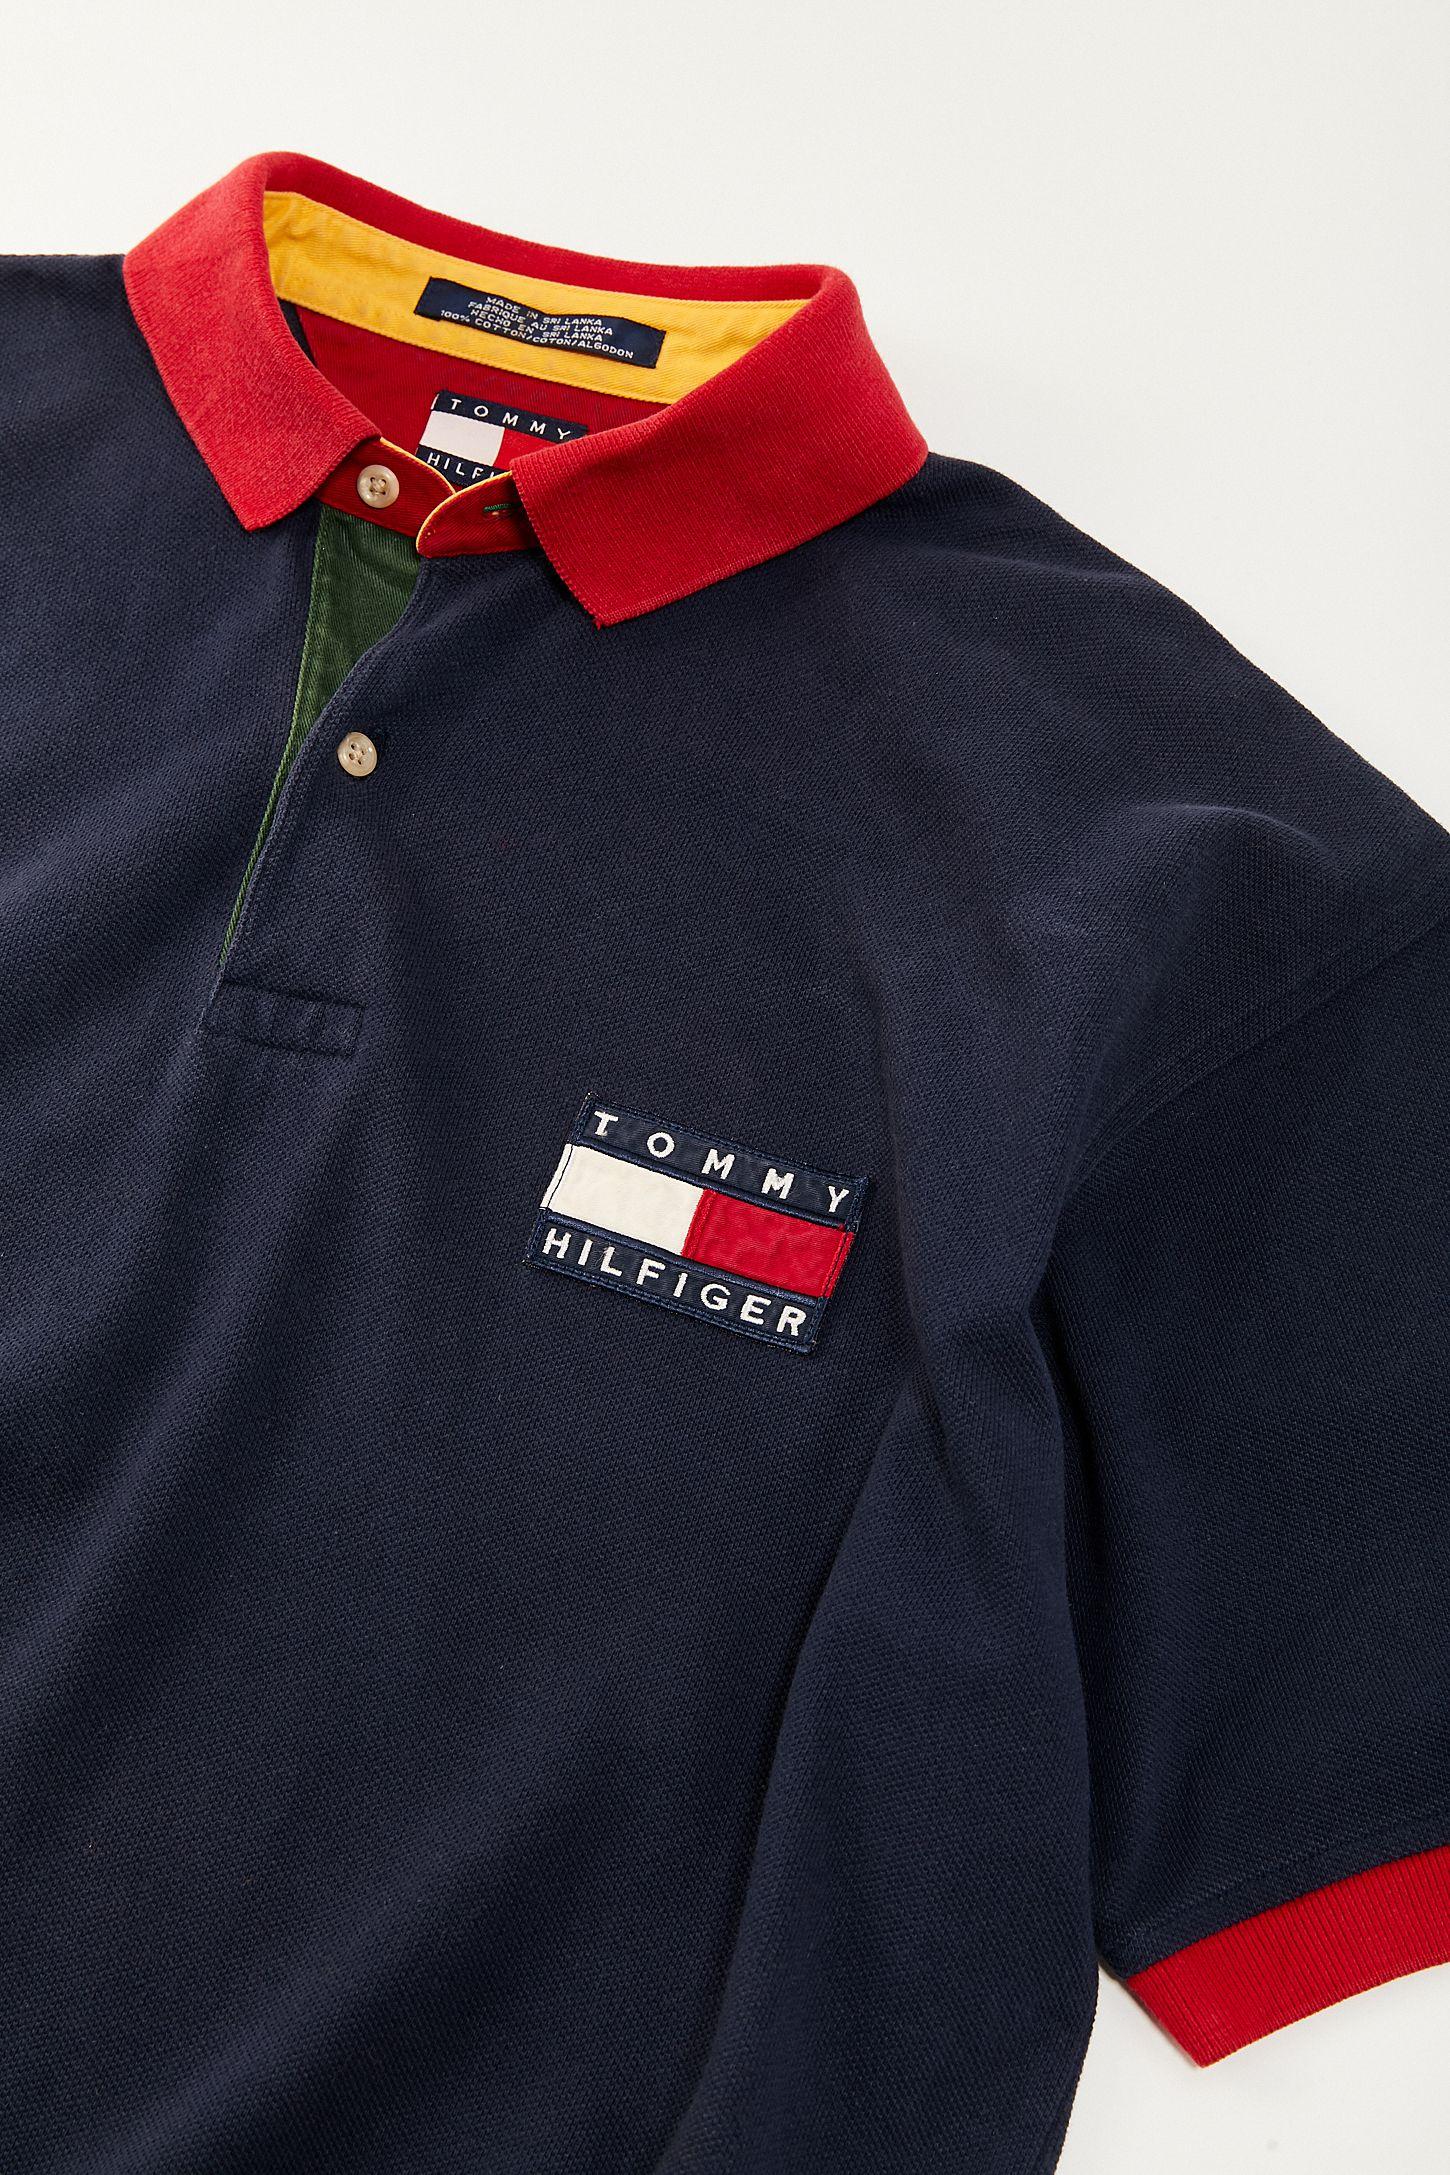 4c9b483126c42 Vintage Tommy Hilfiger  90s Flag Polo Shirt